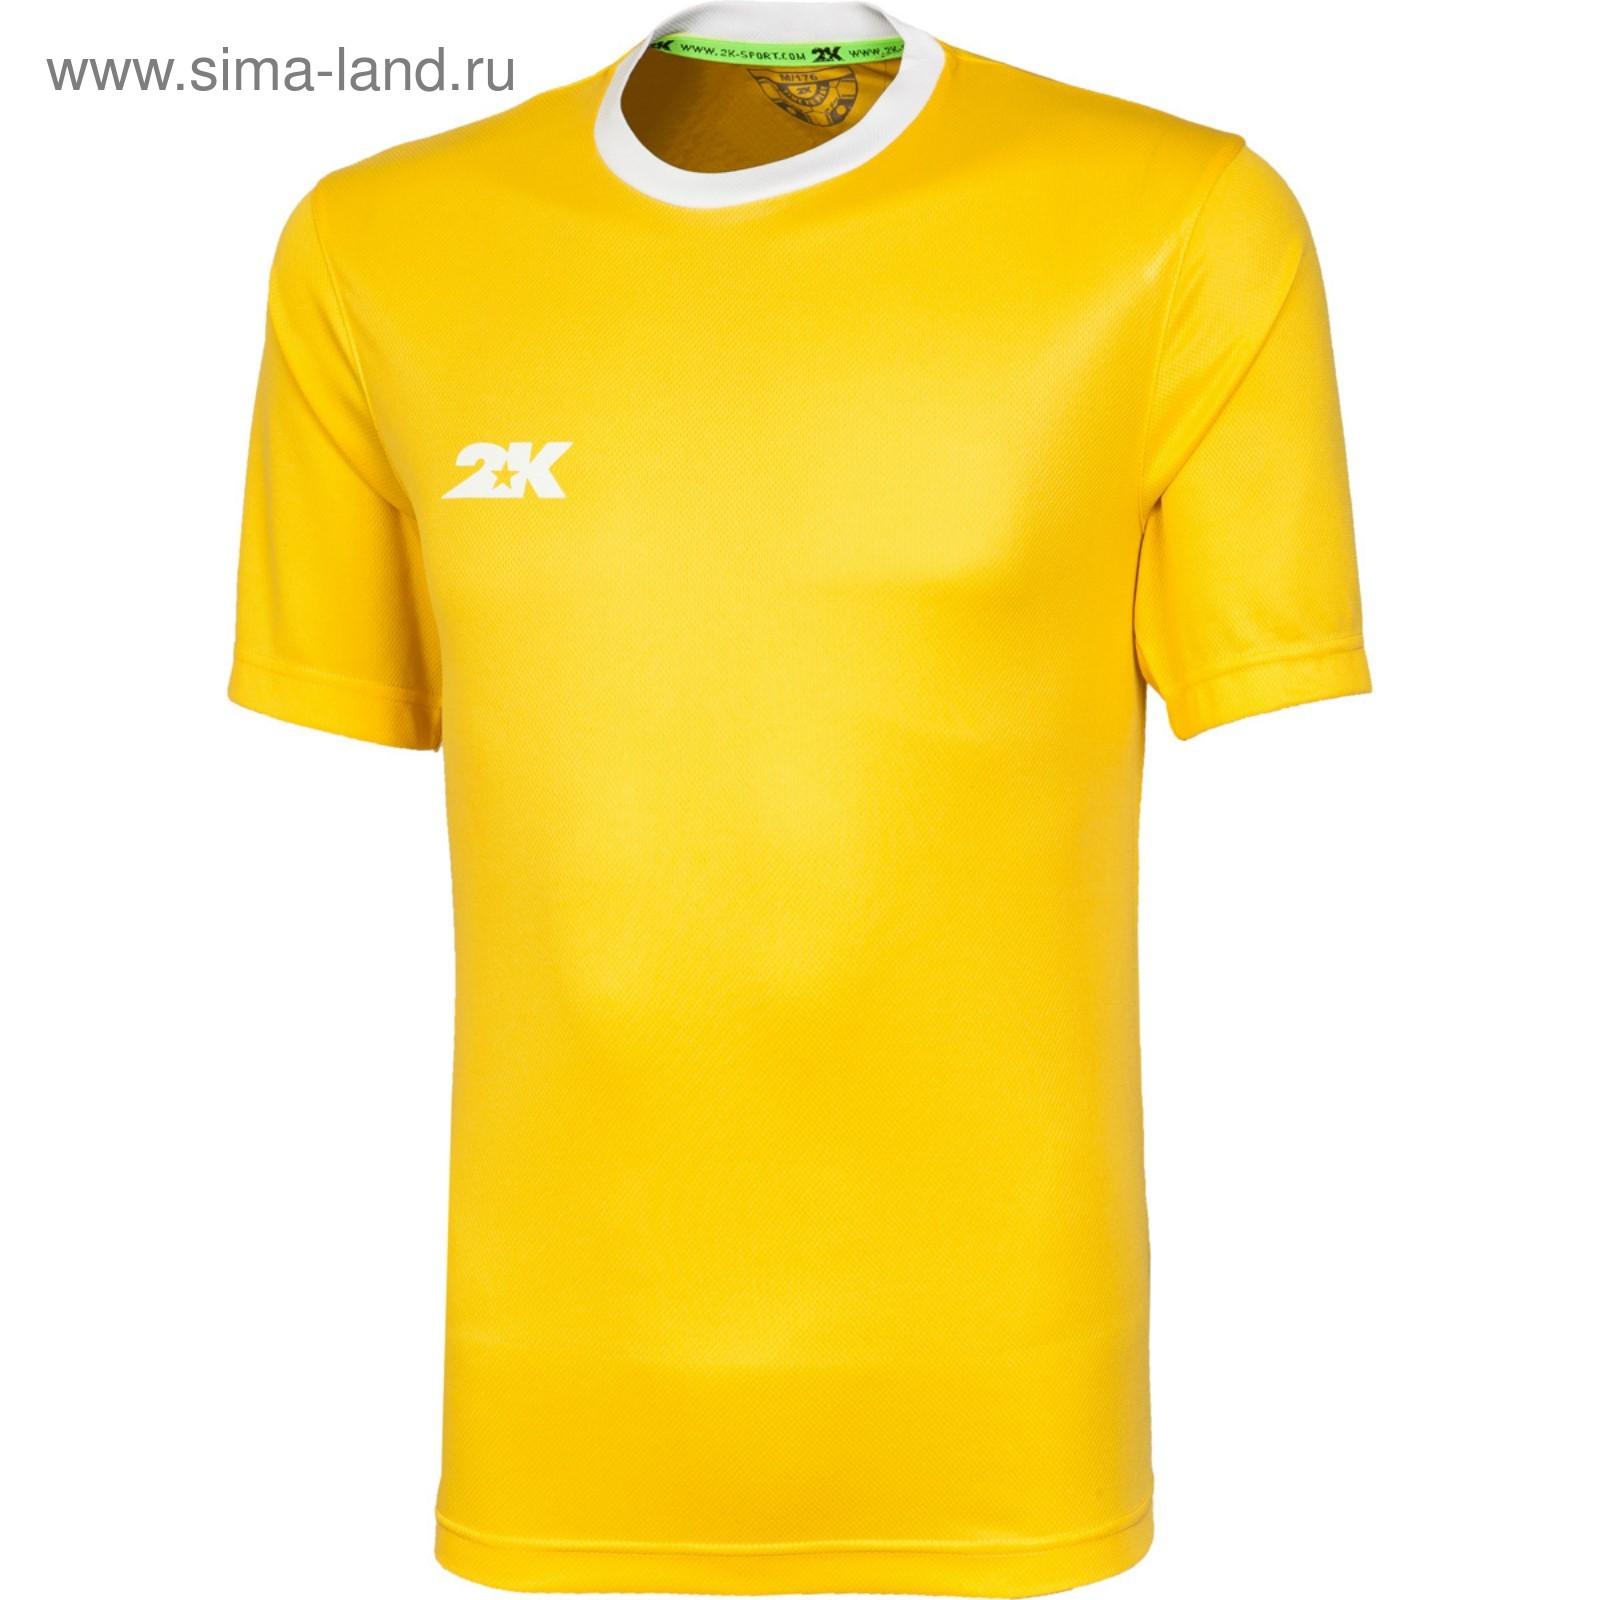 900538f6 Футболка игровая 2K Sport Classic yellow/white, 146 (3748364 ...